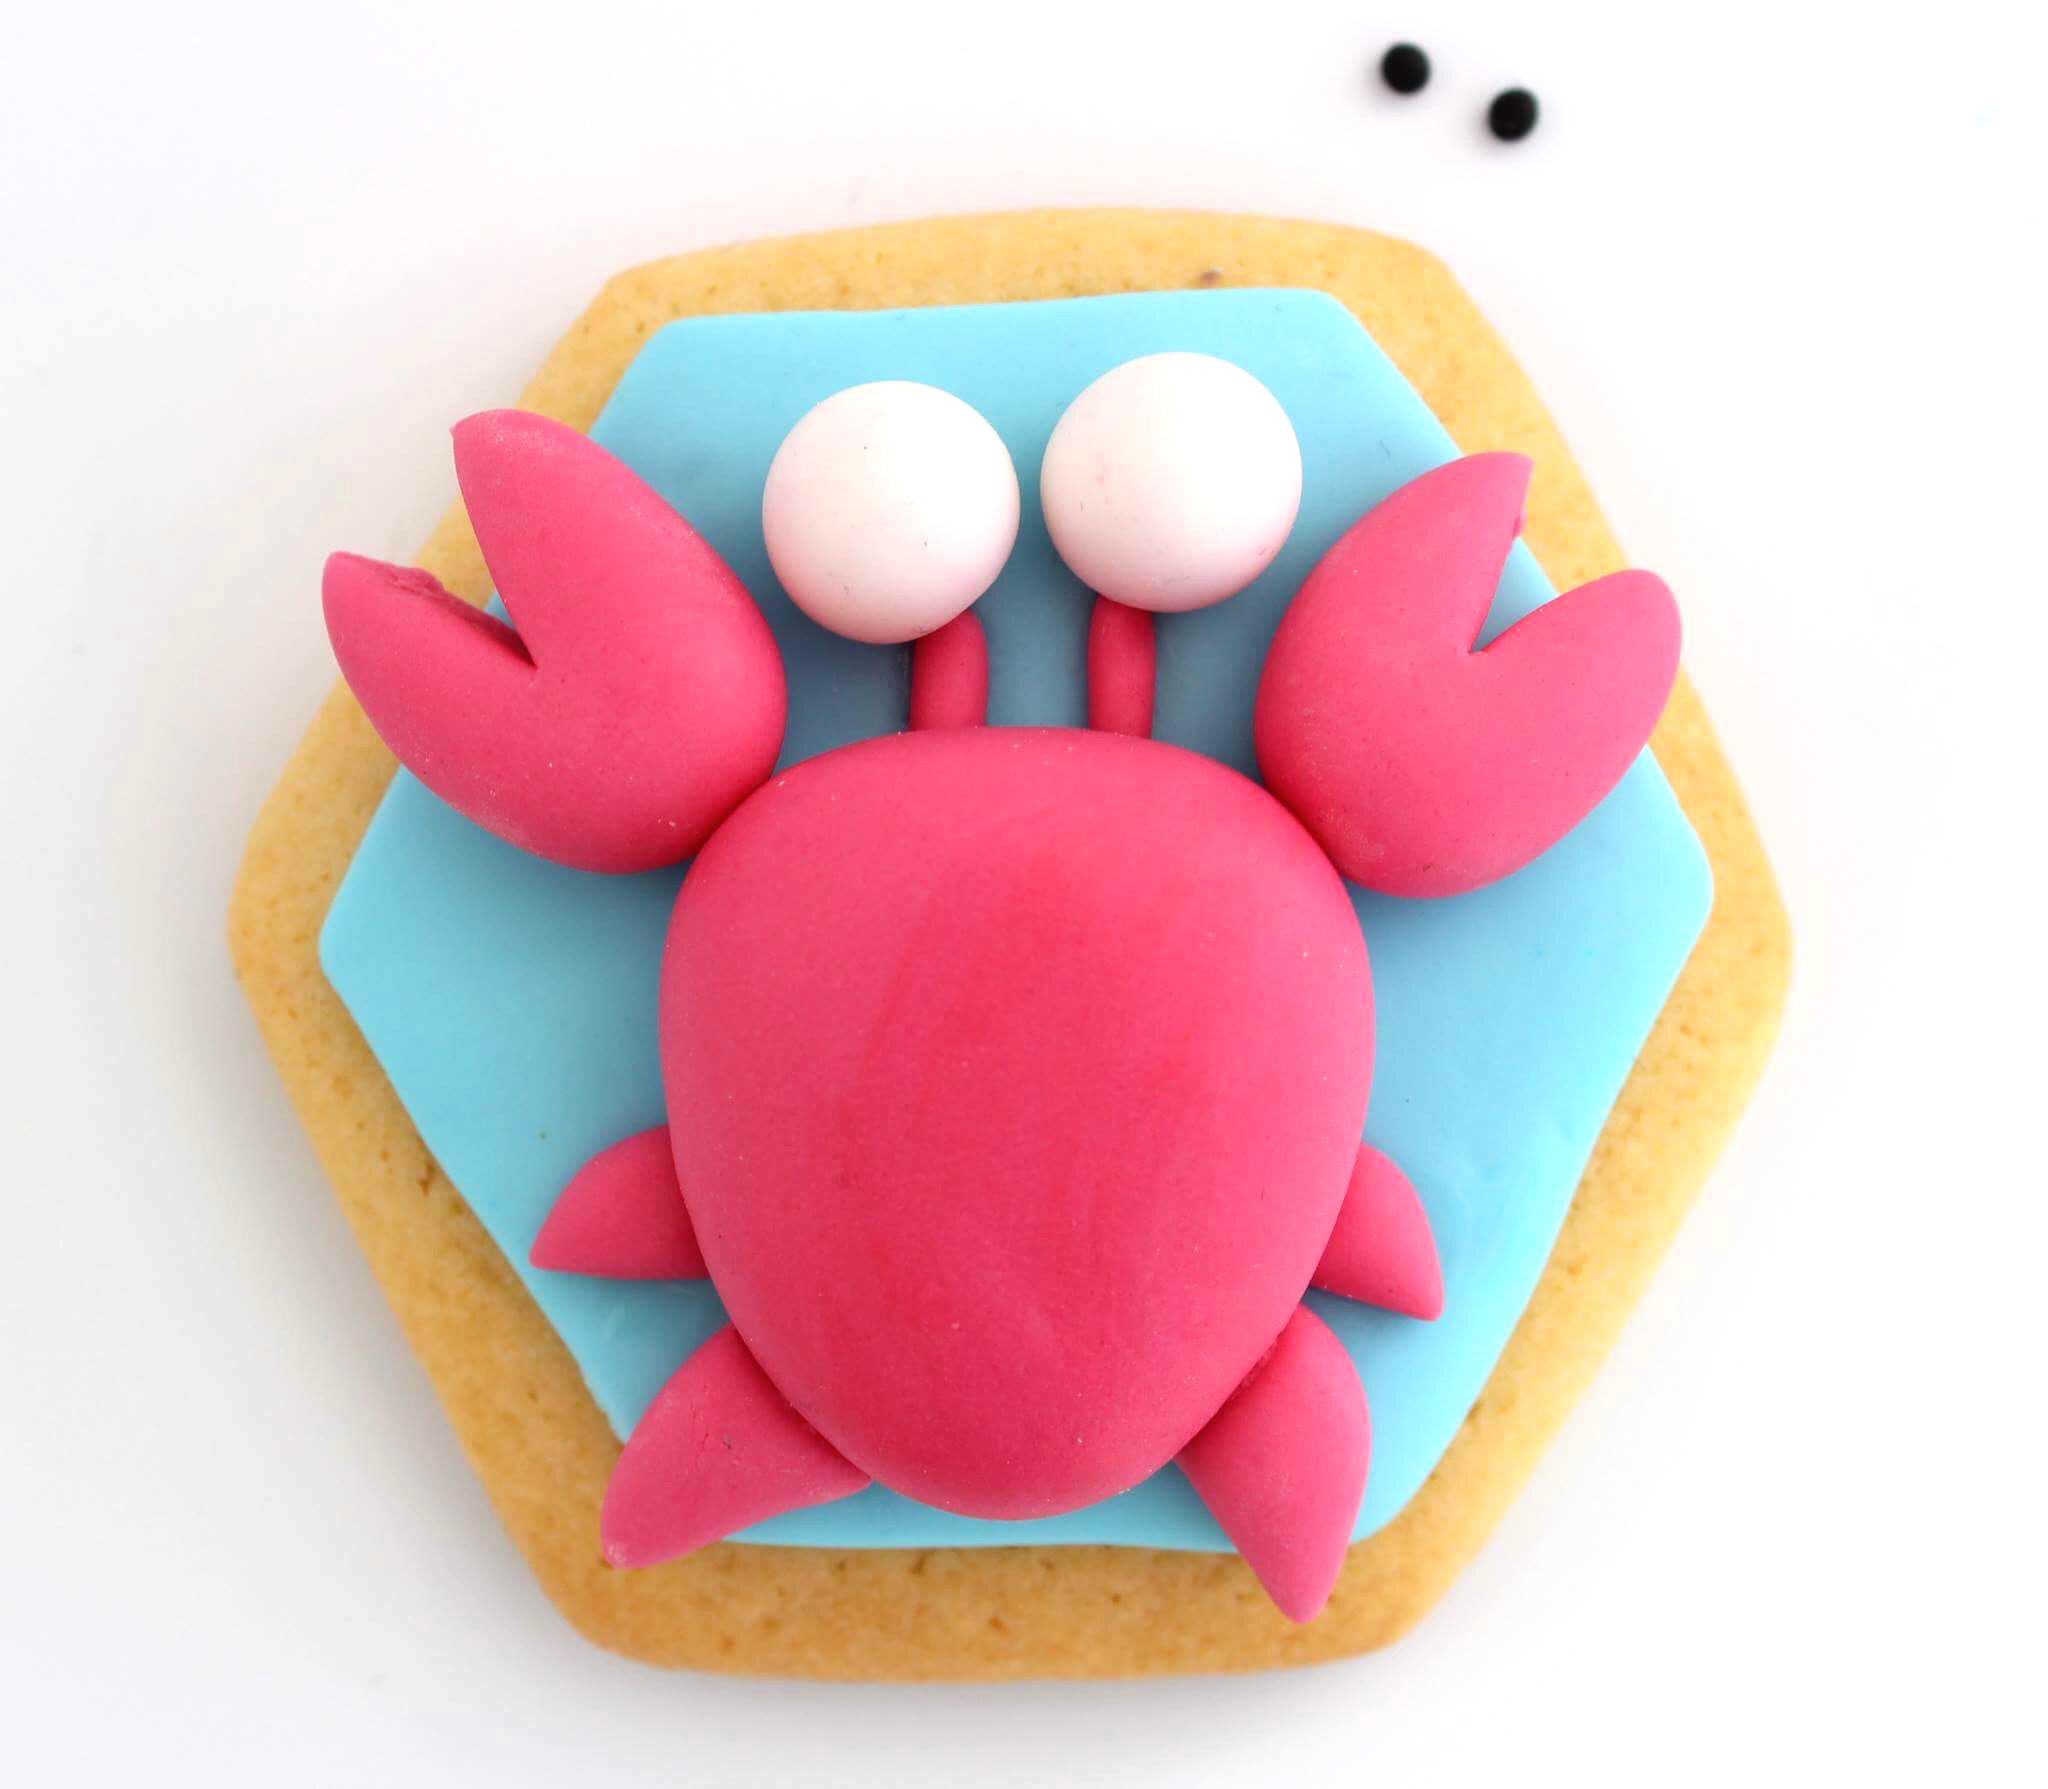 sff17_CrabTutorial-Monique-Ascanelli-The-Cake-Topper-Step4.JPG#asset:17075